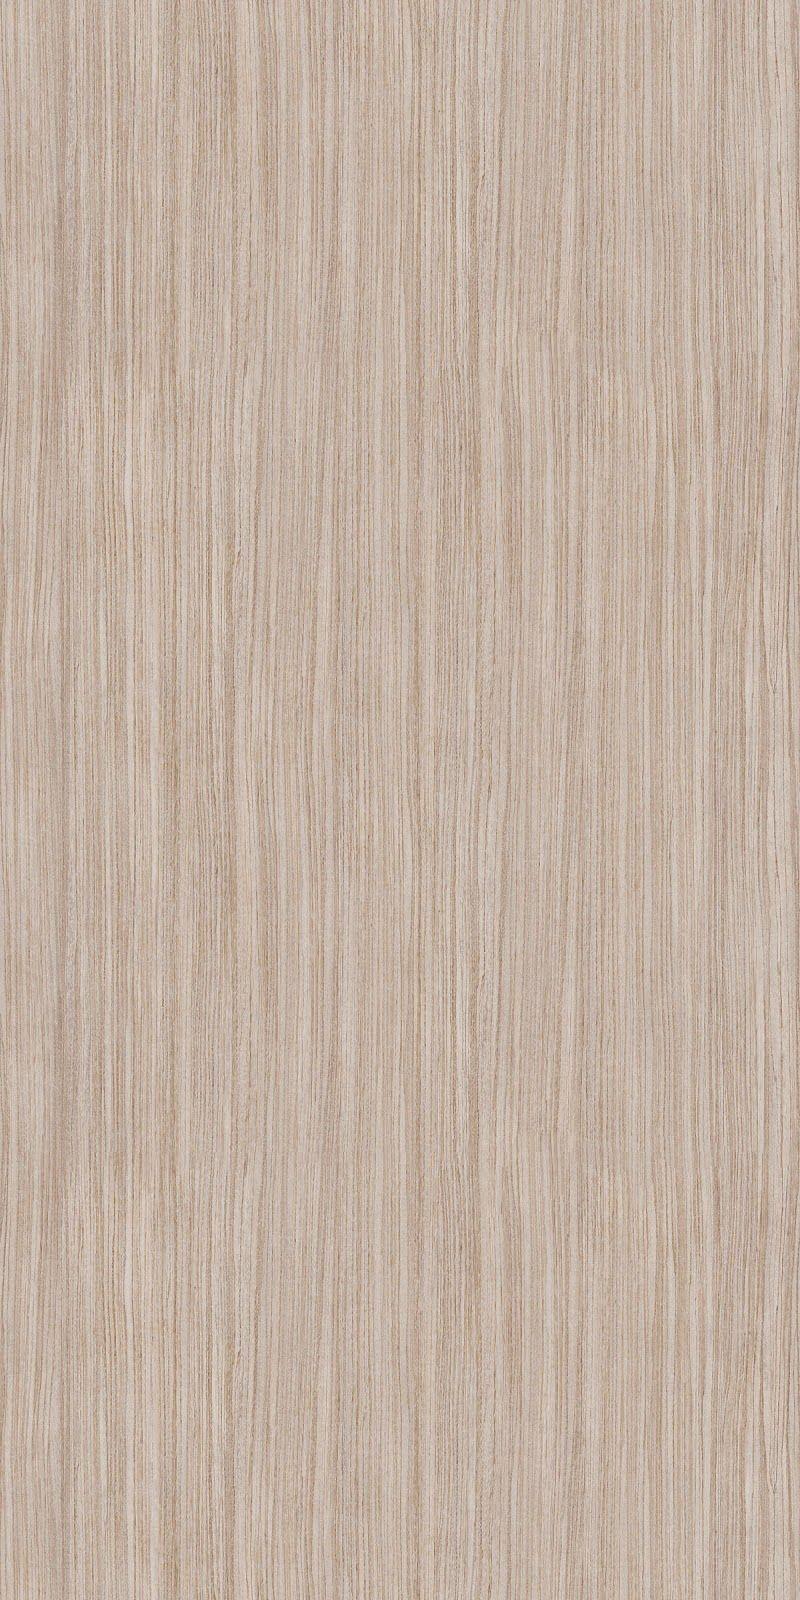 laminate flooring texture seamless seamless fine wood laminate texture + (maps) | texturise KJZETEG